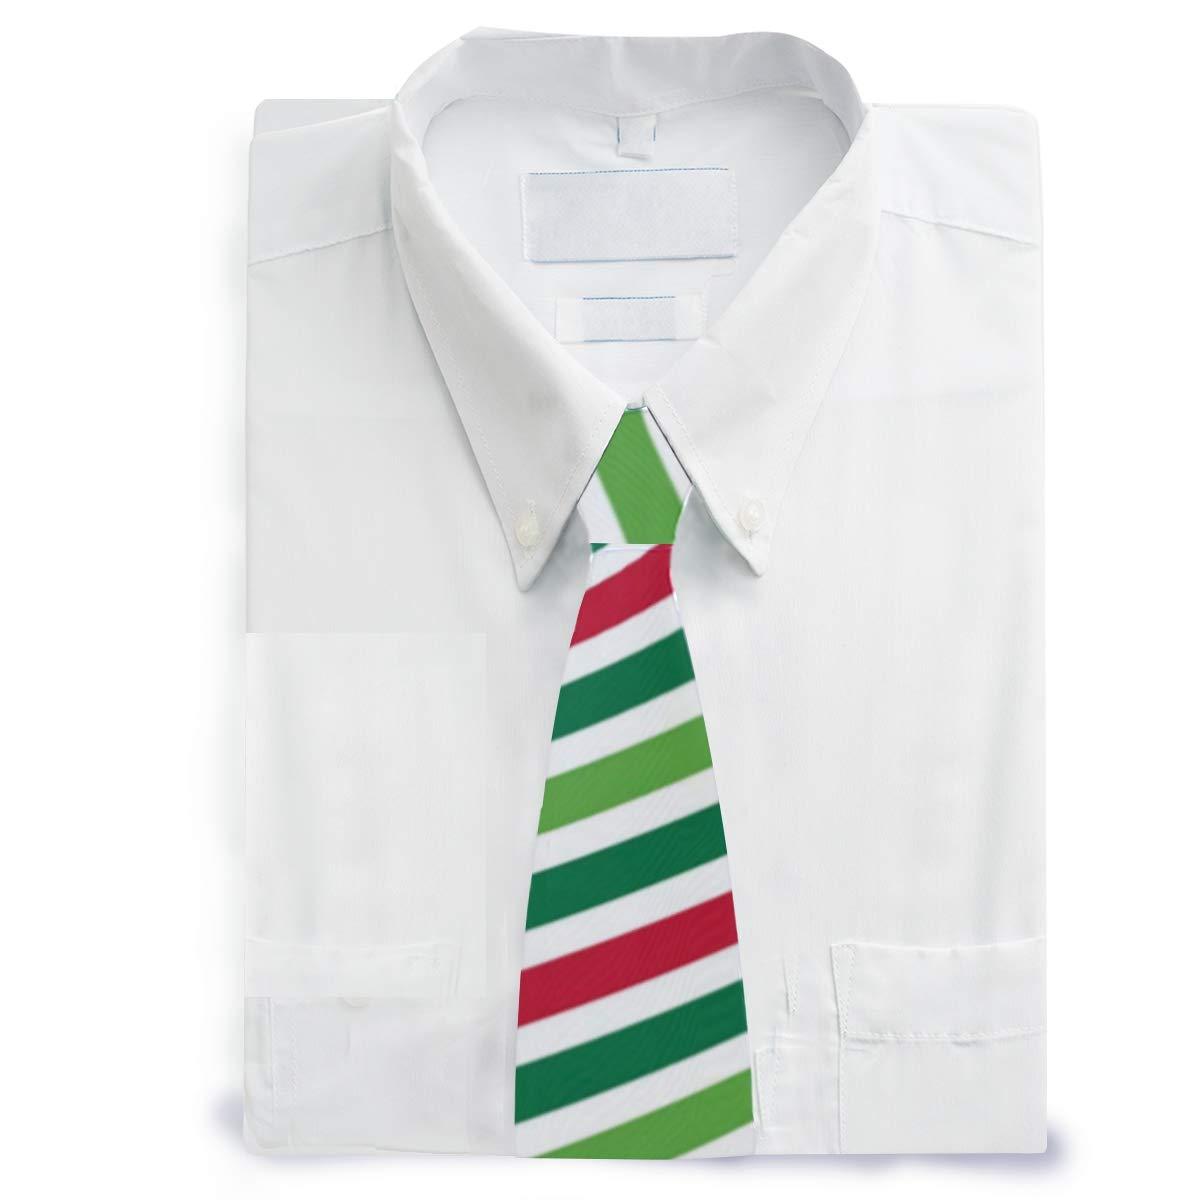 MALPLENA - Corbata de satén para hombre con diseño de lazo rojo de ...